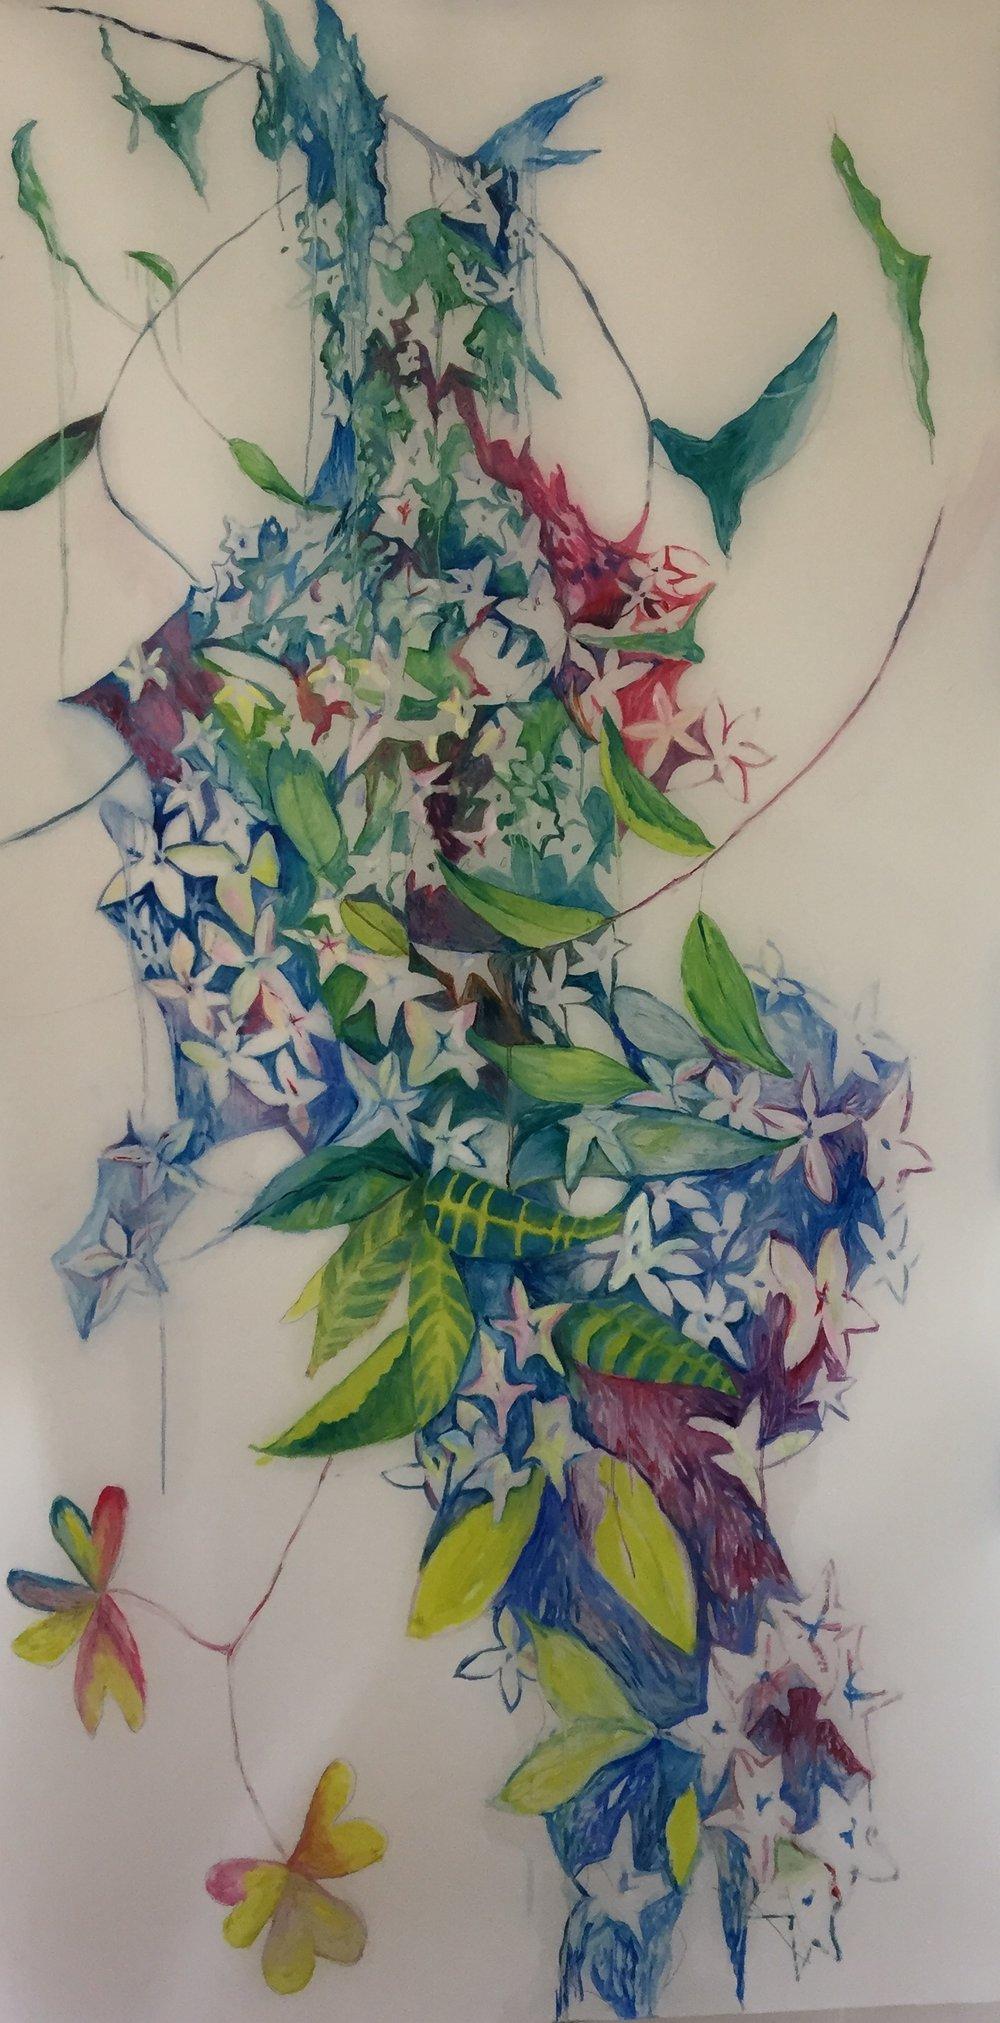 Floral Burst 2, Nuit Blanche Installation